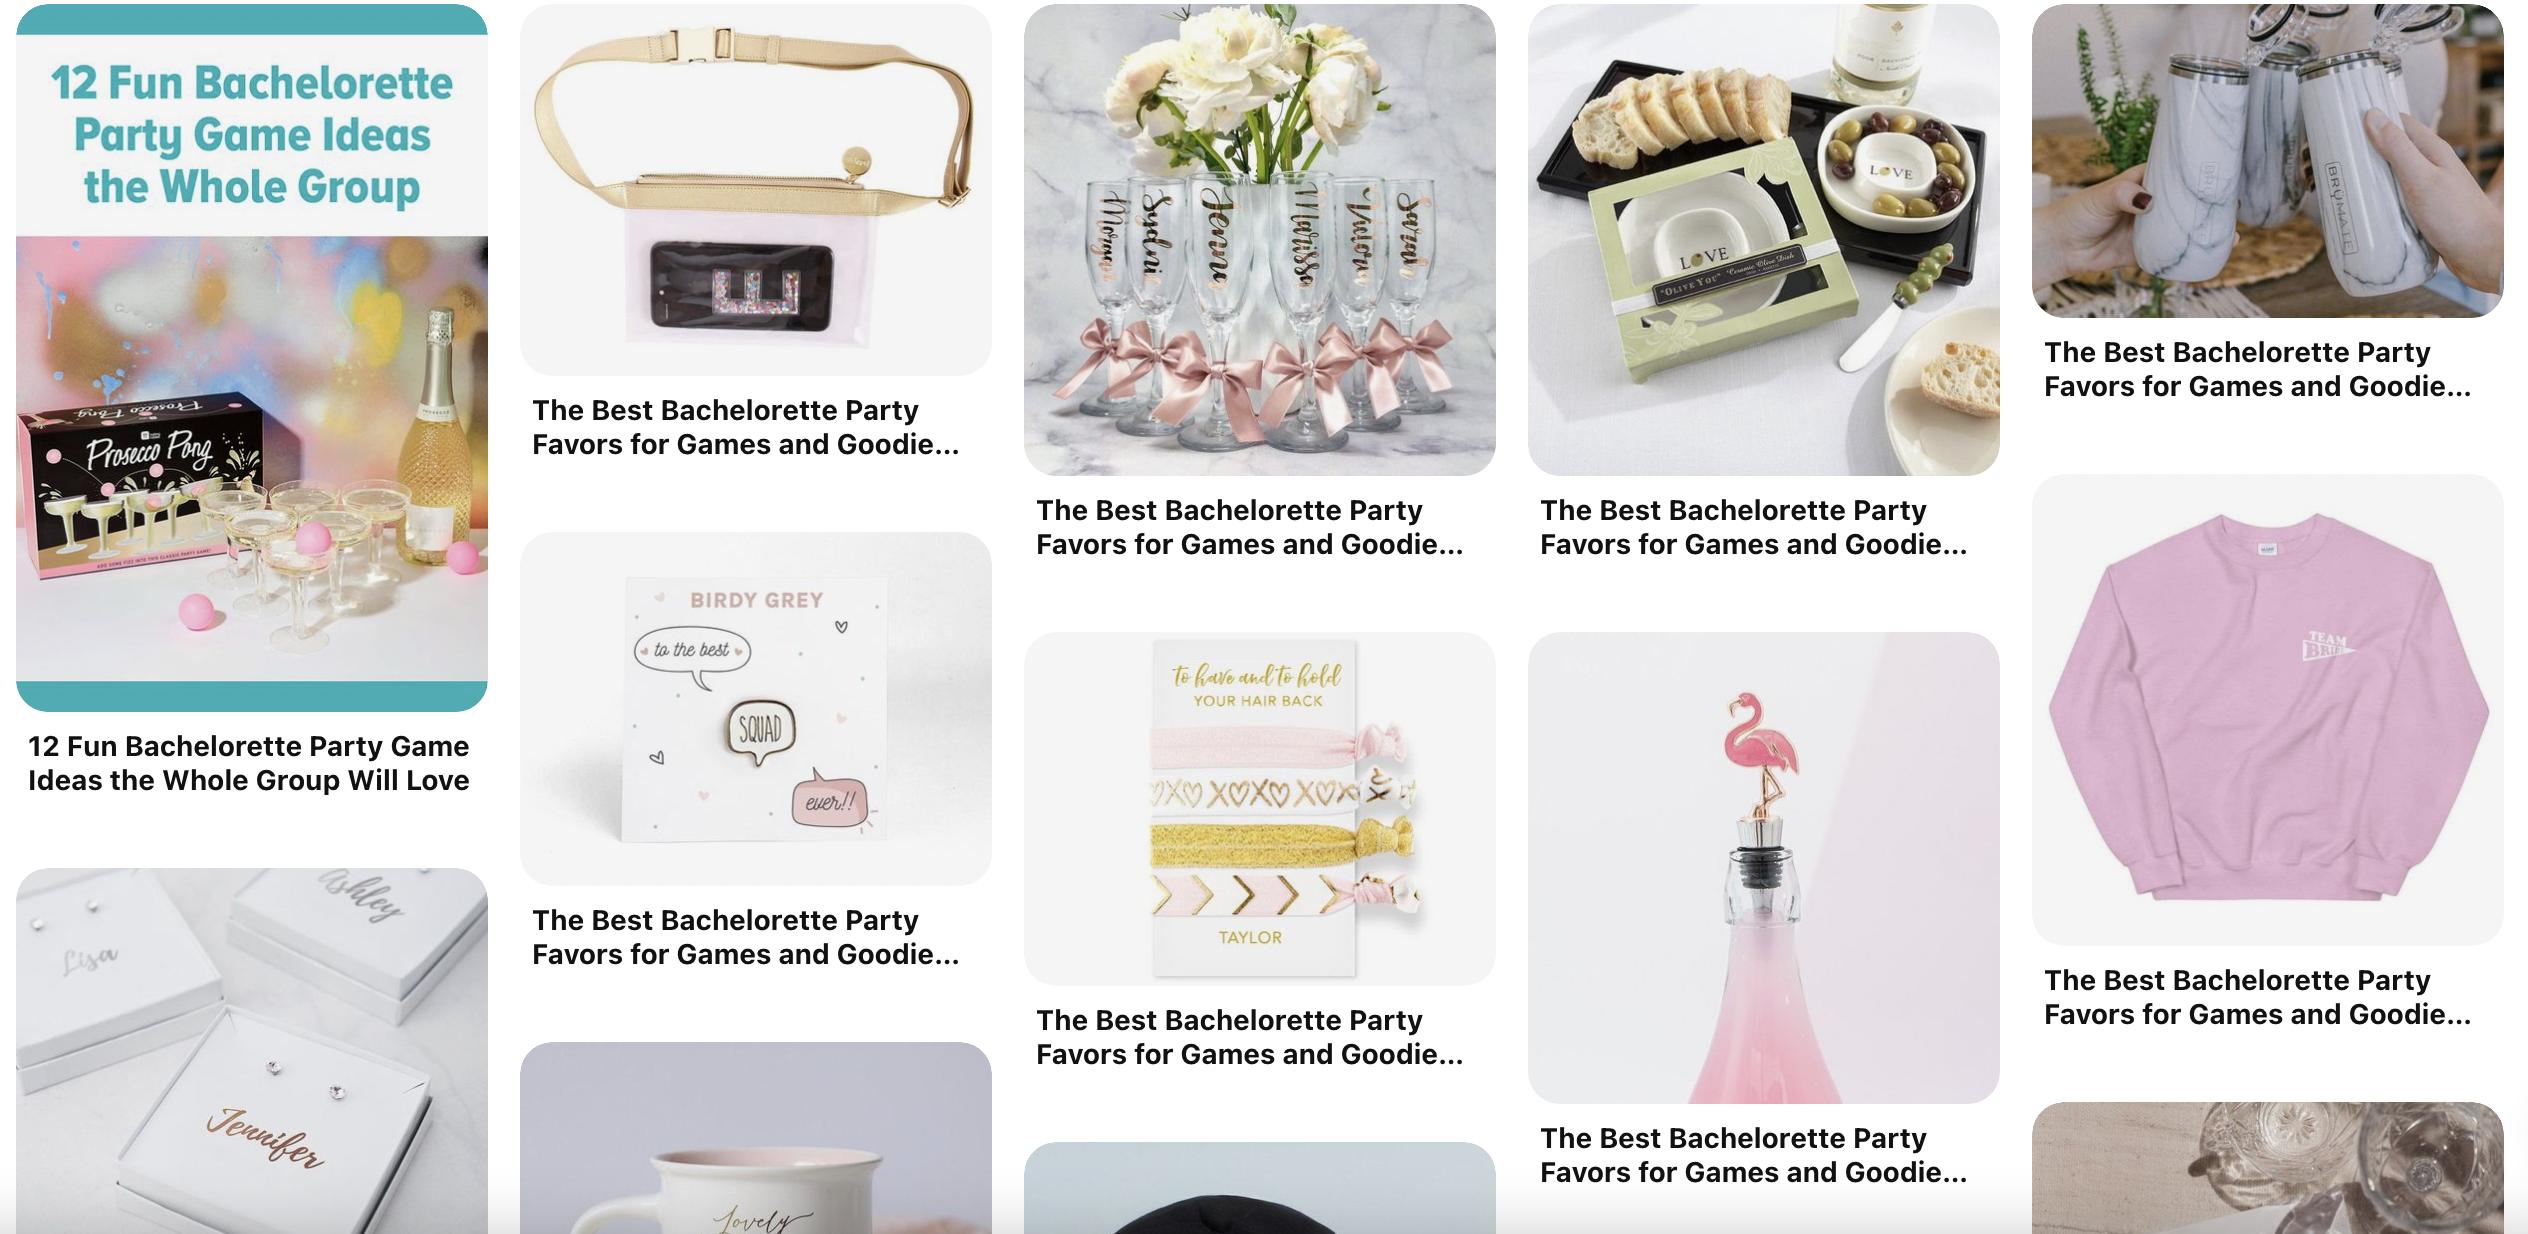 Bachelorette Party Cake Ideas on Pinterest: Wedding Wire